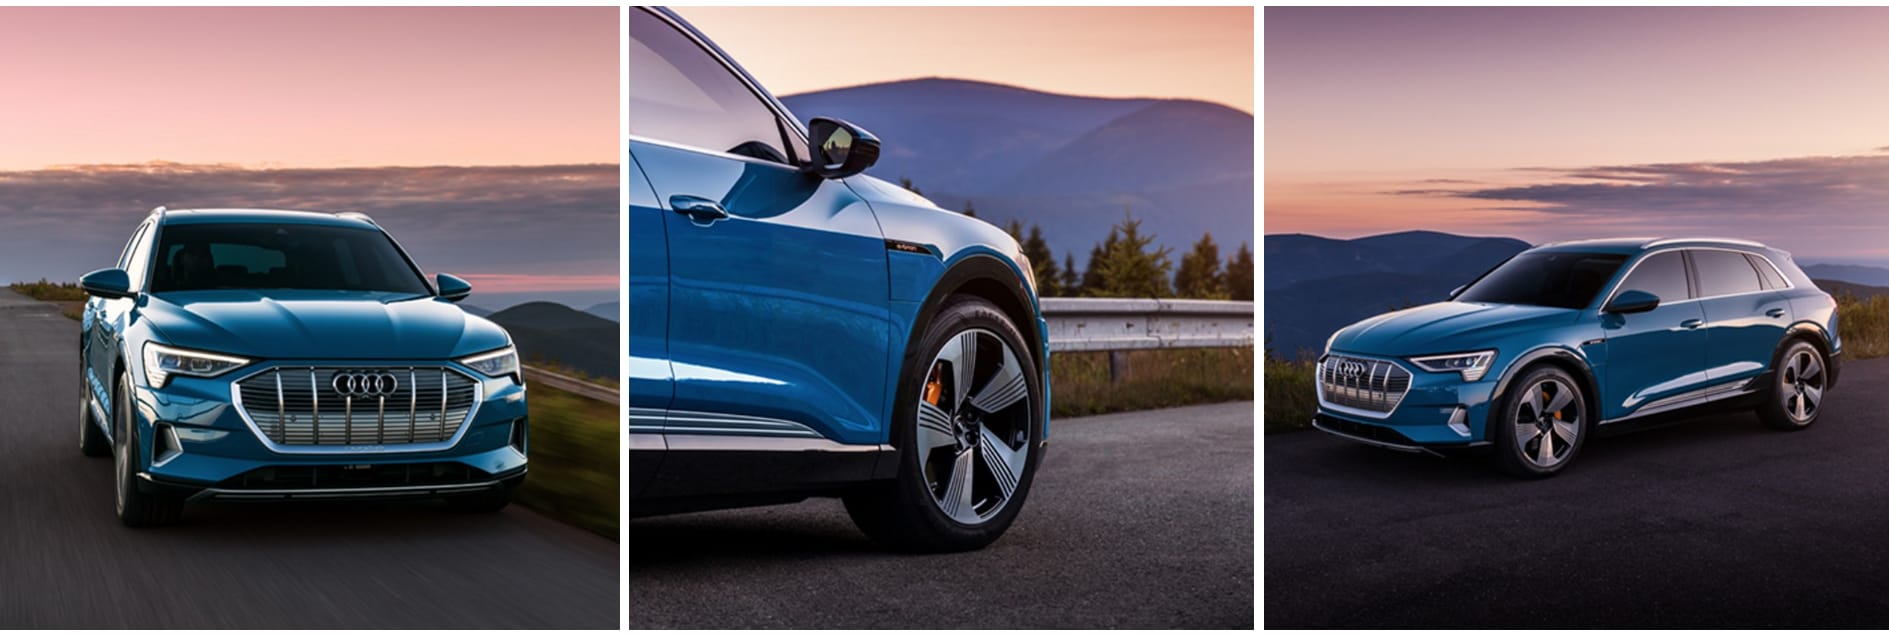 Fletcher Jones Fremont >> All-New 2019 Audi e-tron quattro in Fremont   Audi Fremont